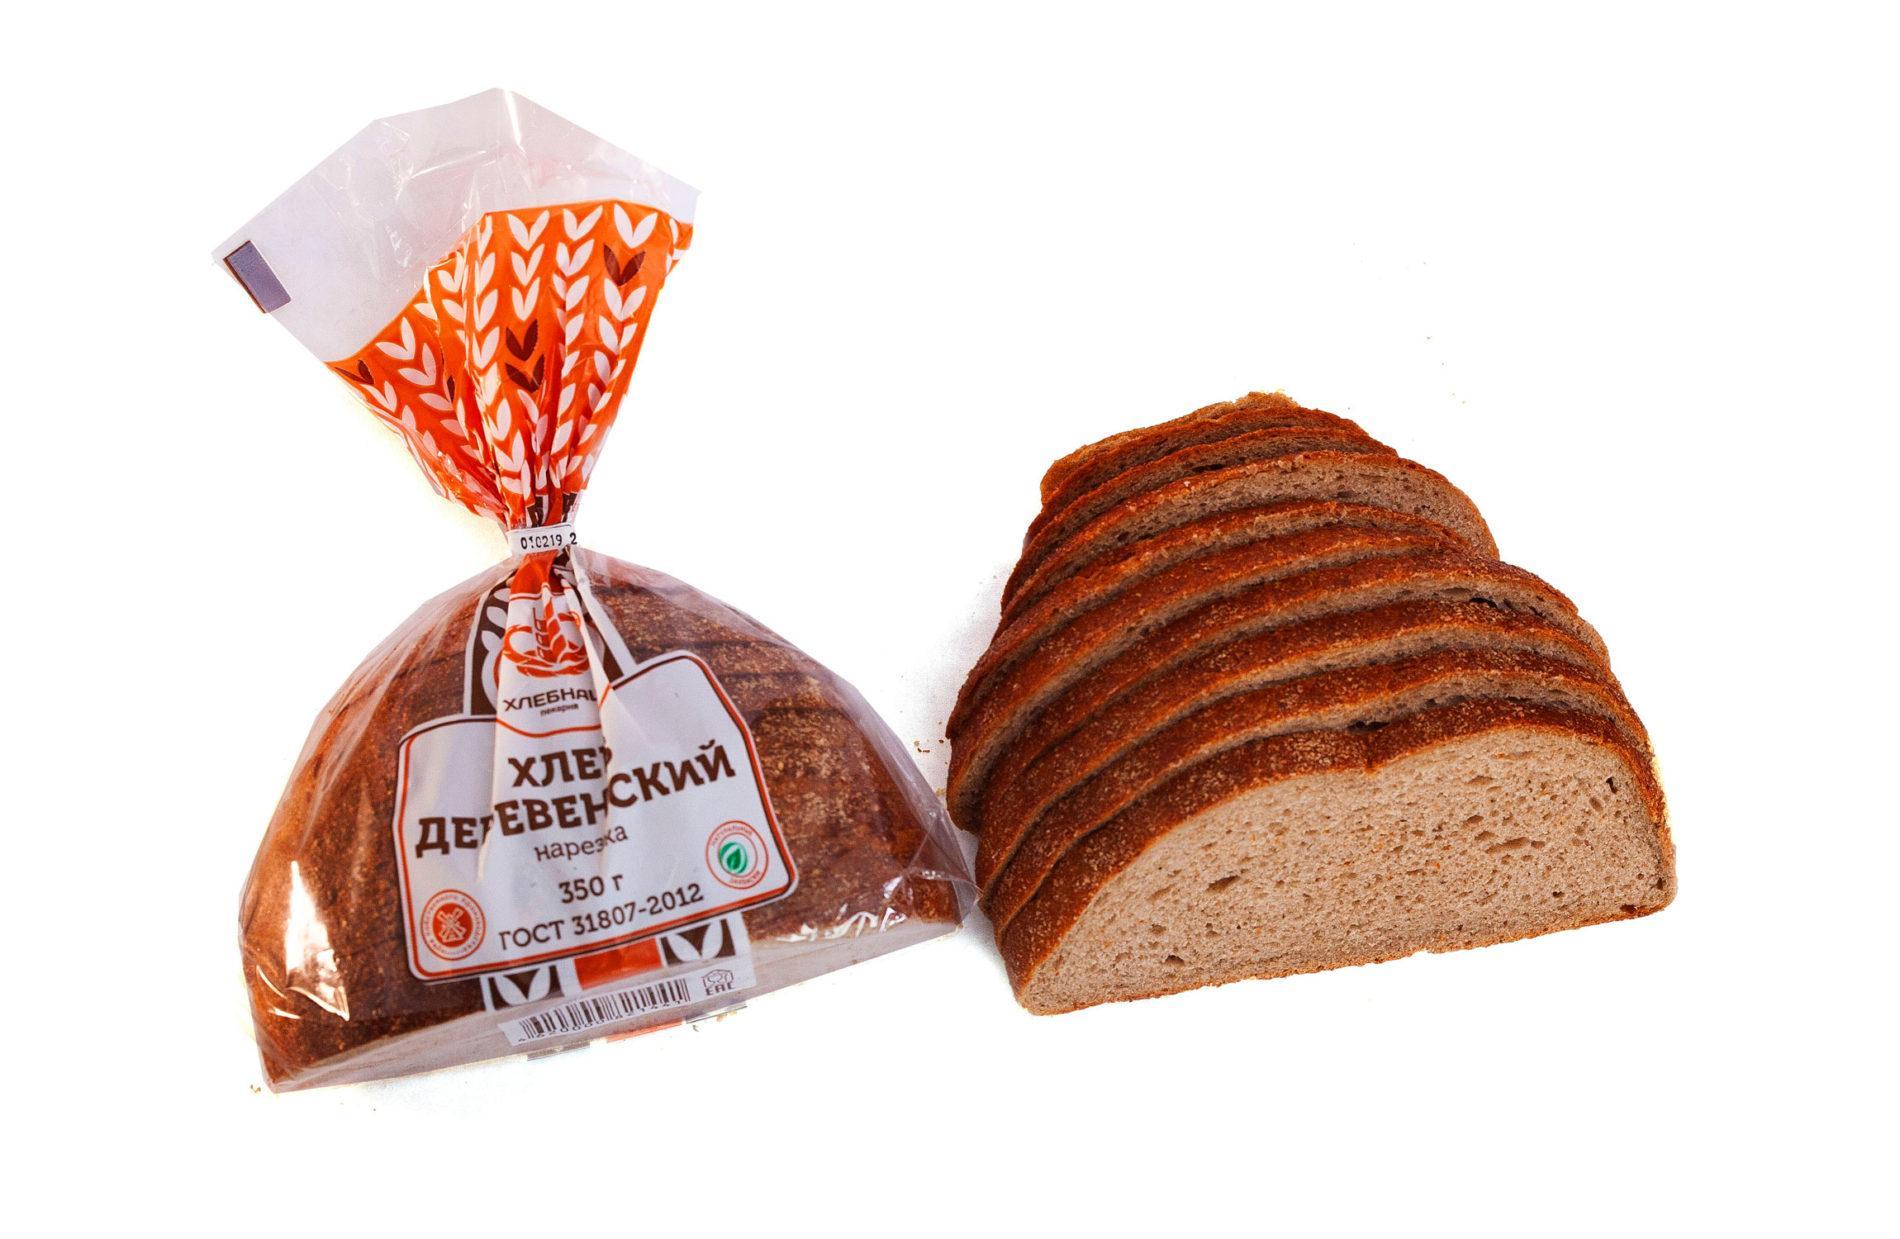 Хлеб-Деревенский